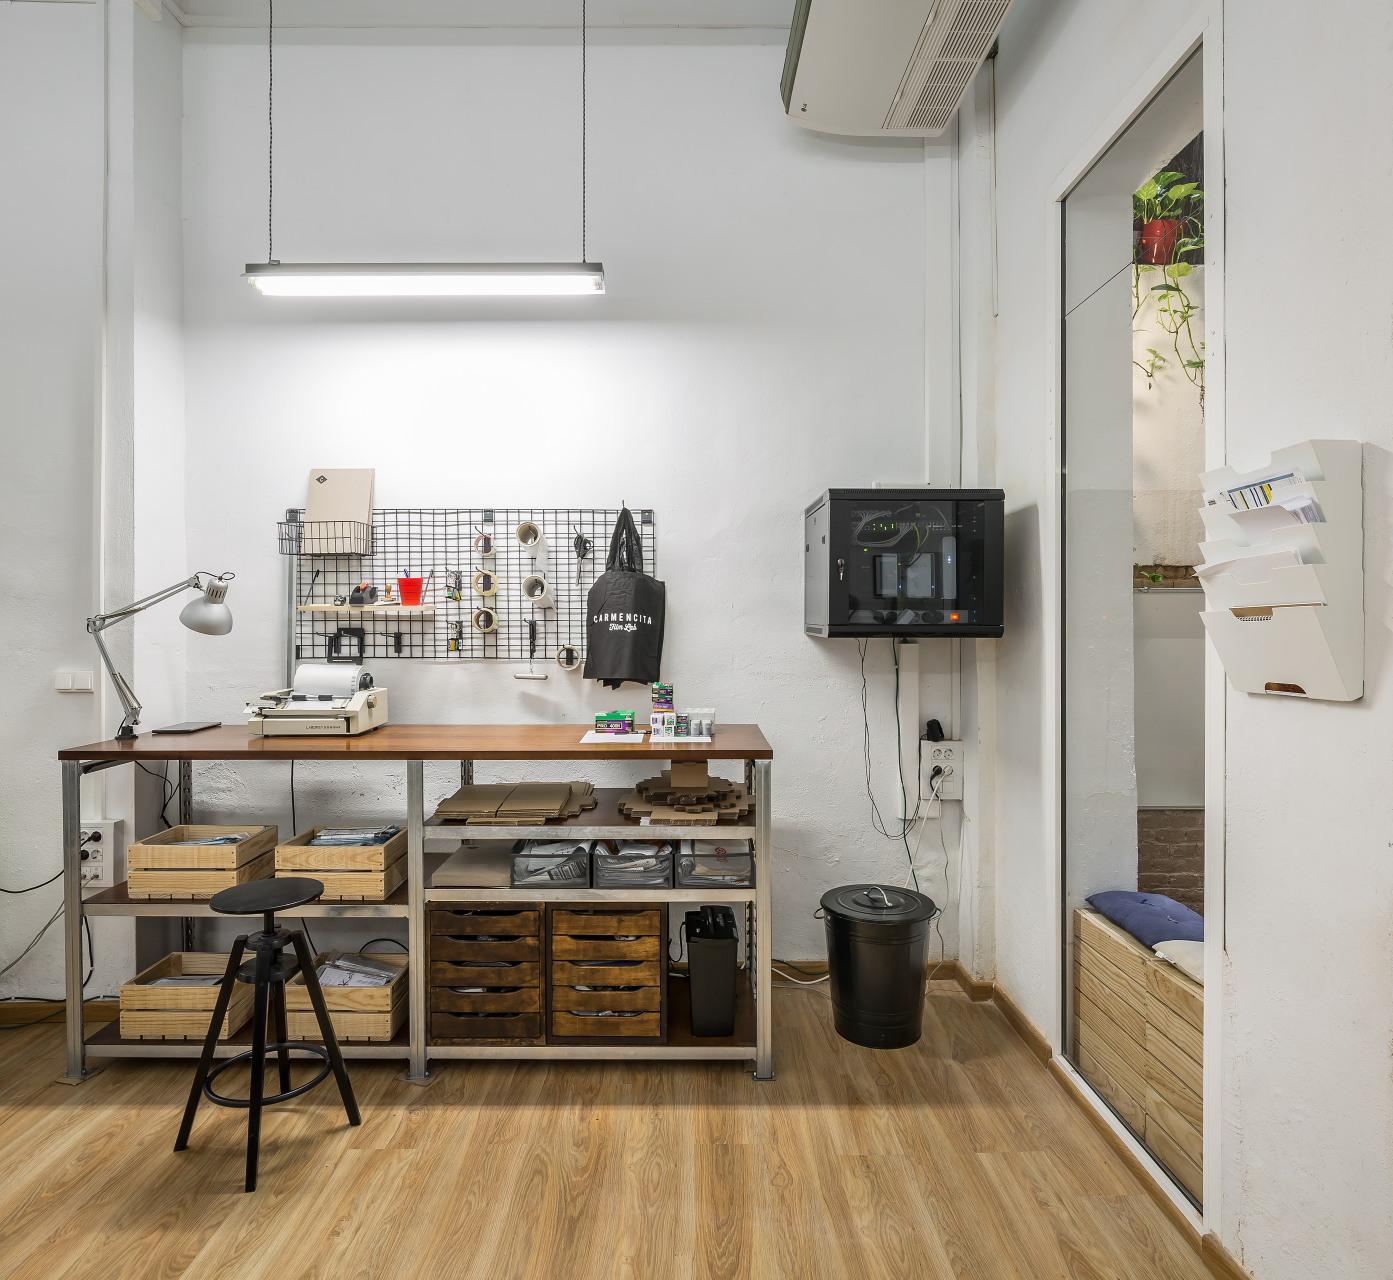 fotografia-arquitectura-interiorismo-valencia-german-cabo-boubau-carmencita-carmencitafilmlab (20)